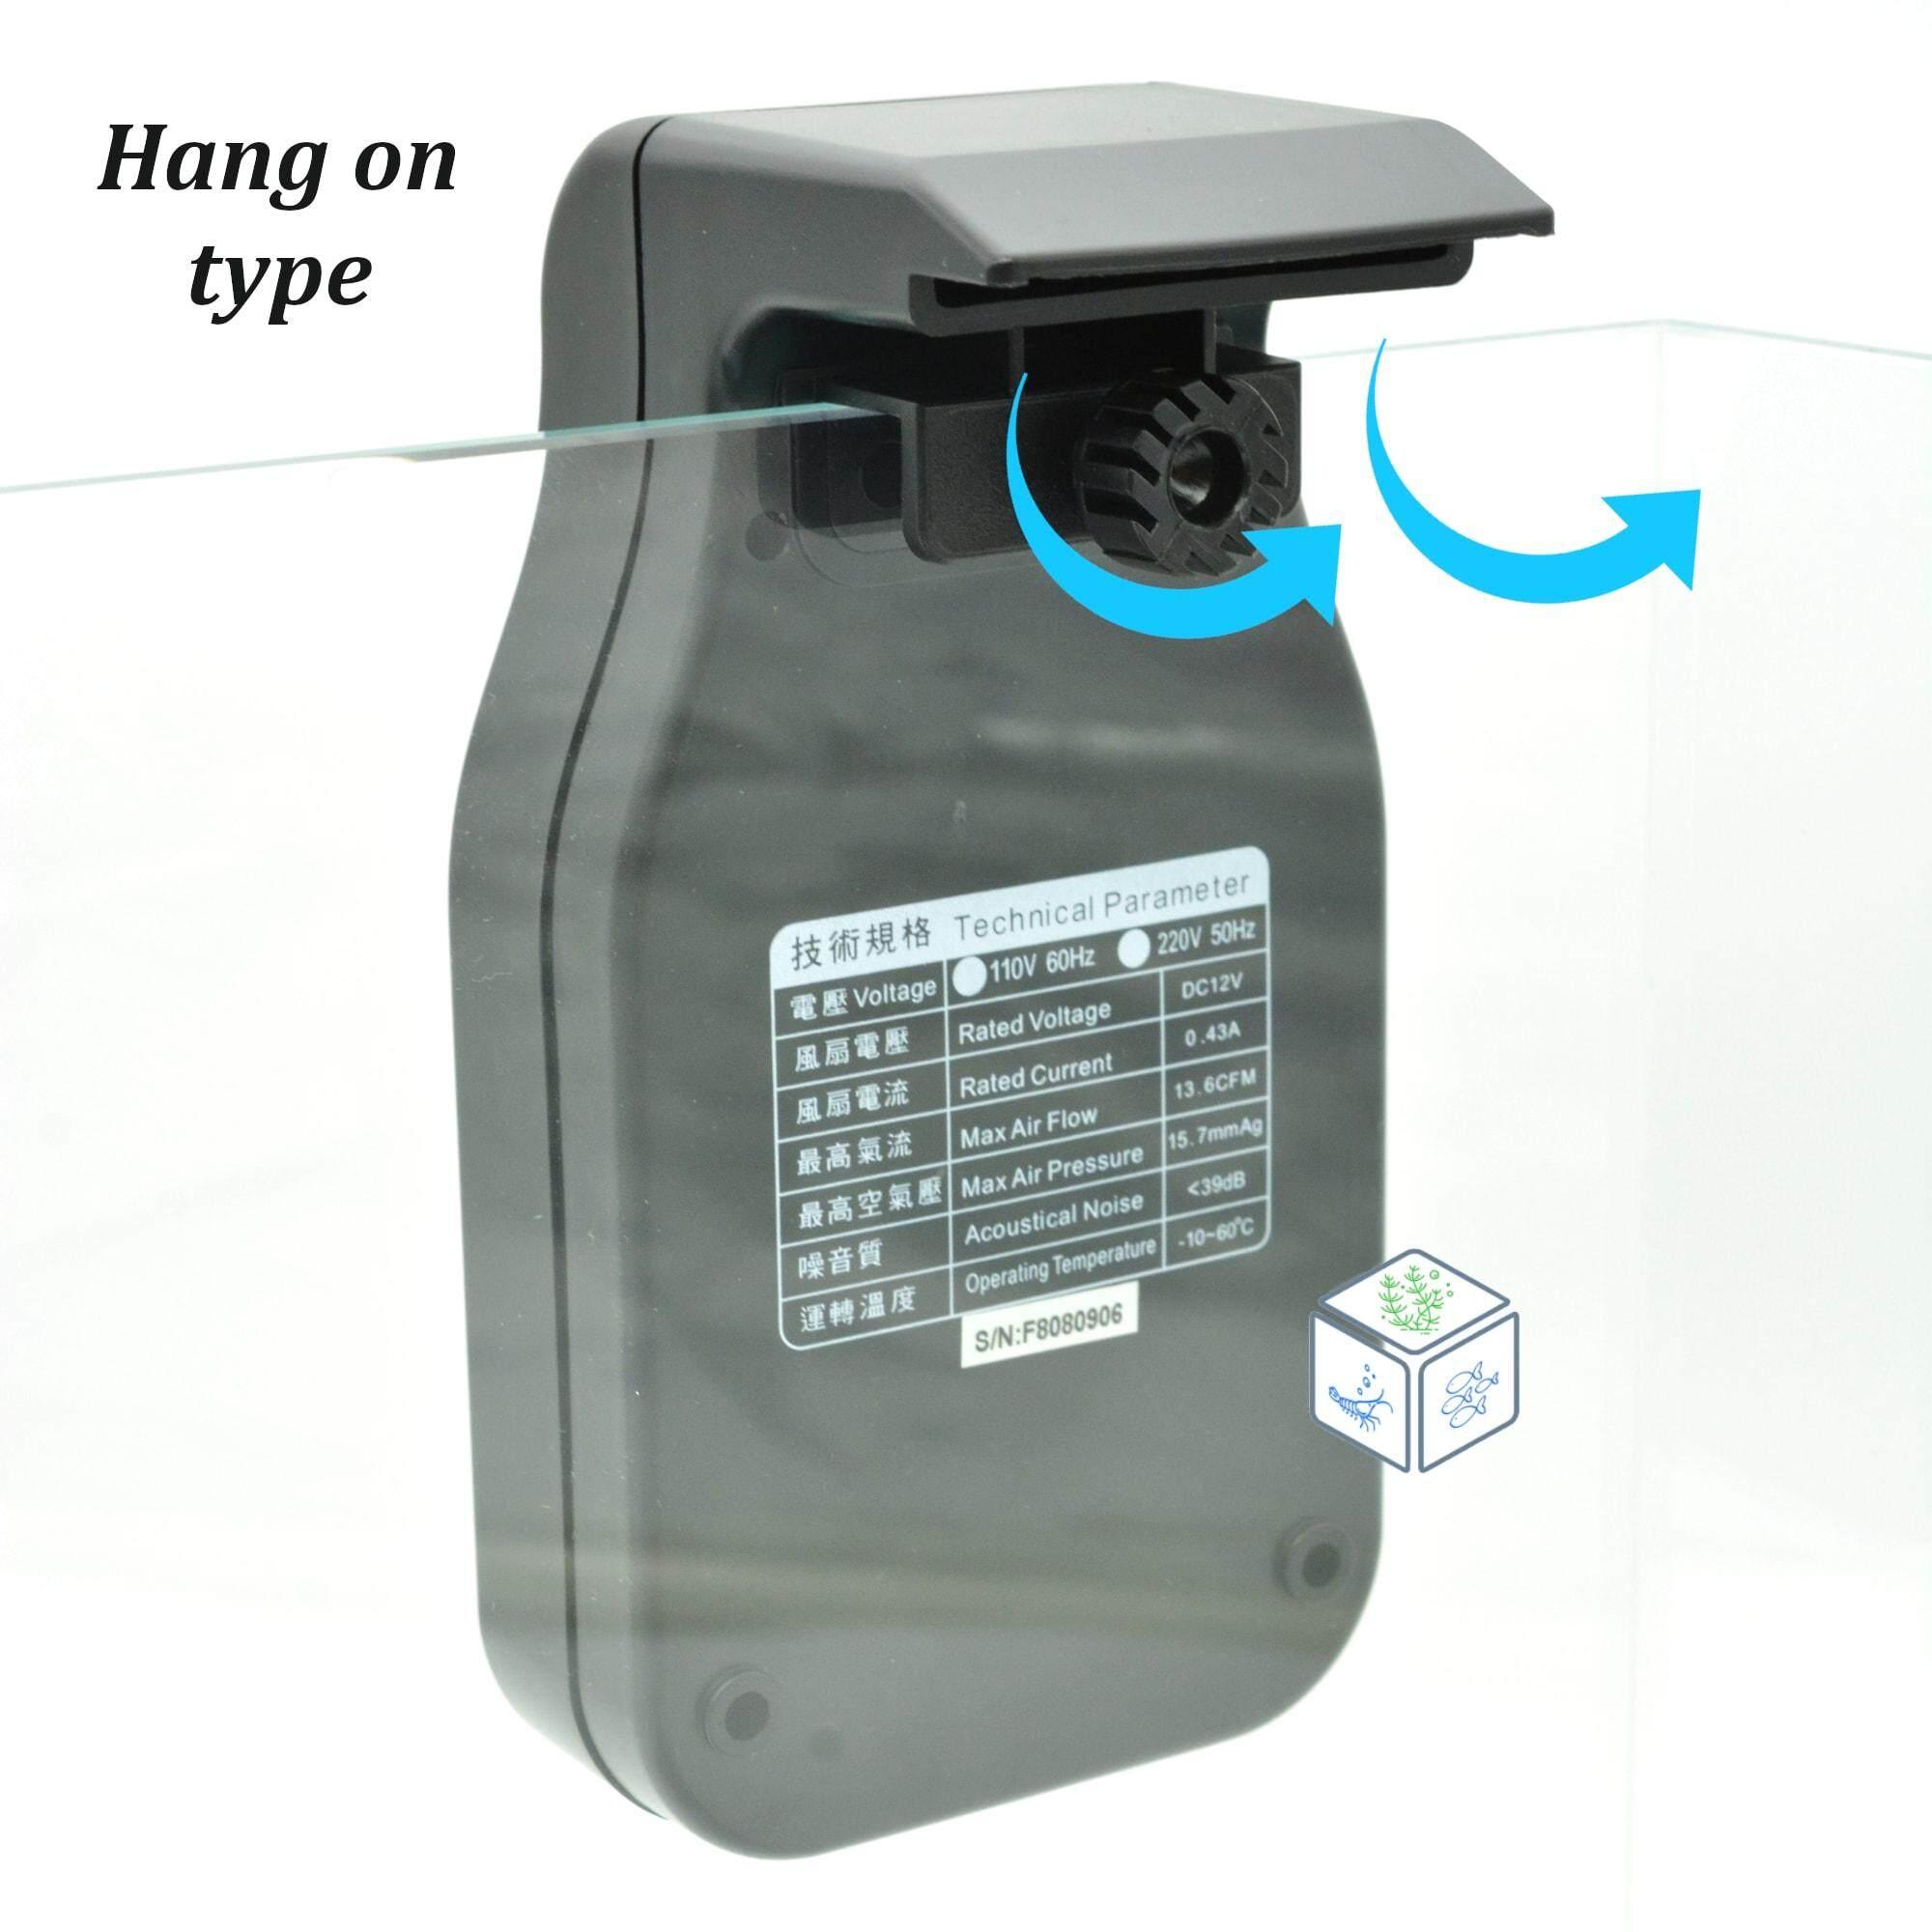 Aquaworld Hang On Type Aquarium Cooling Fan (Black)